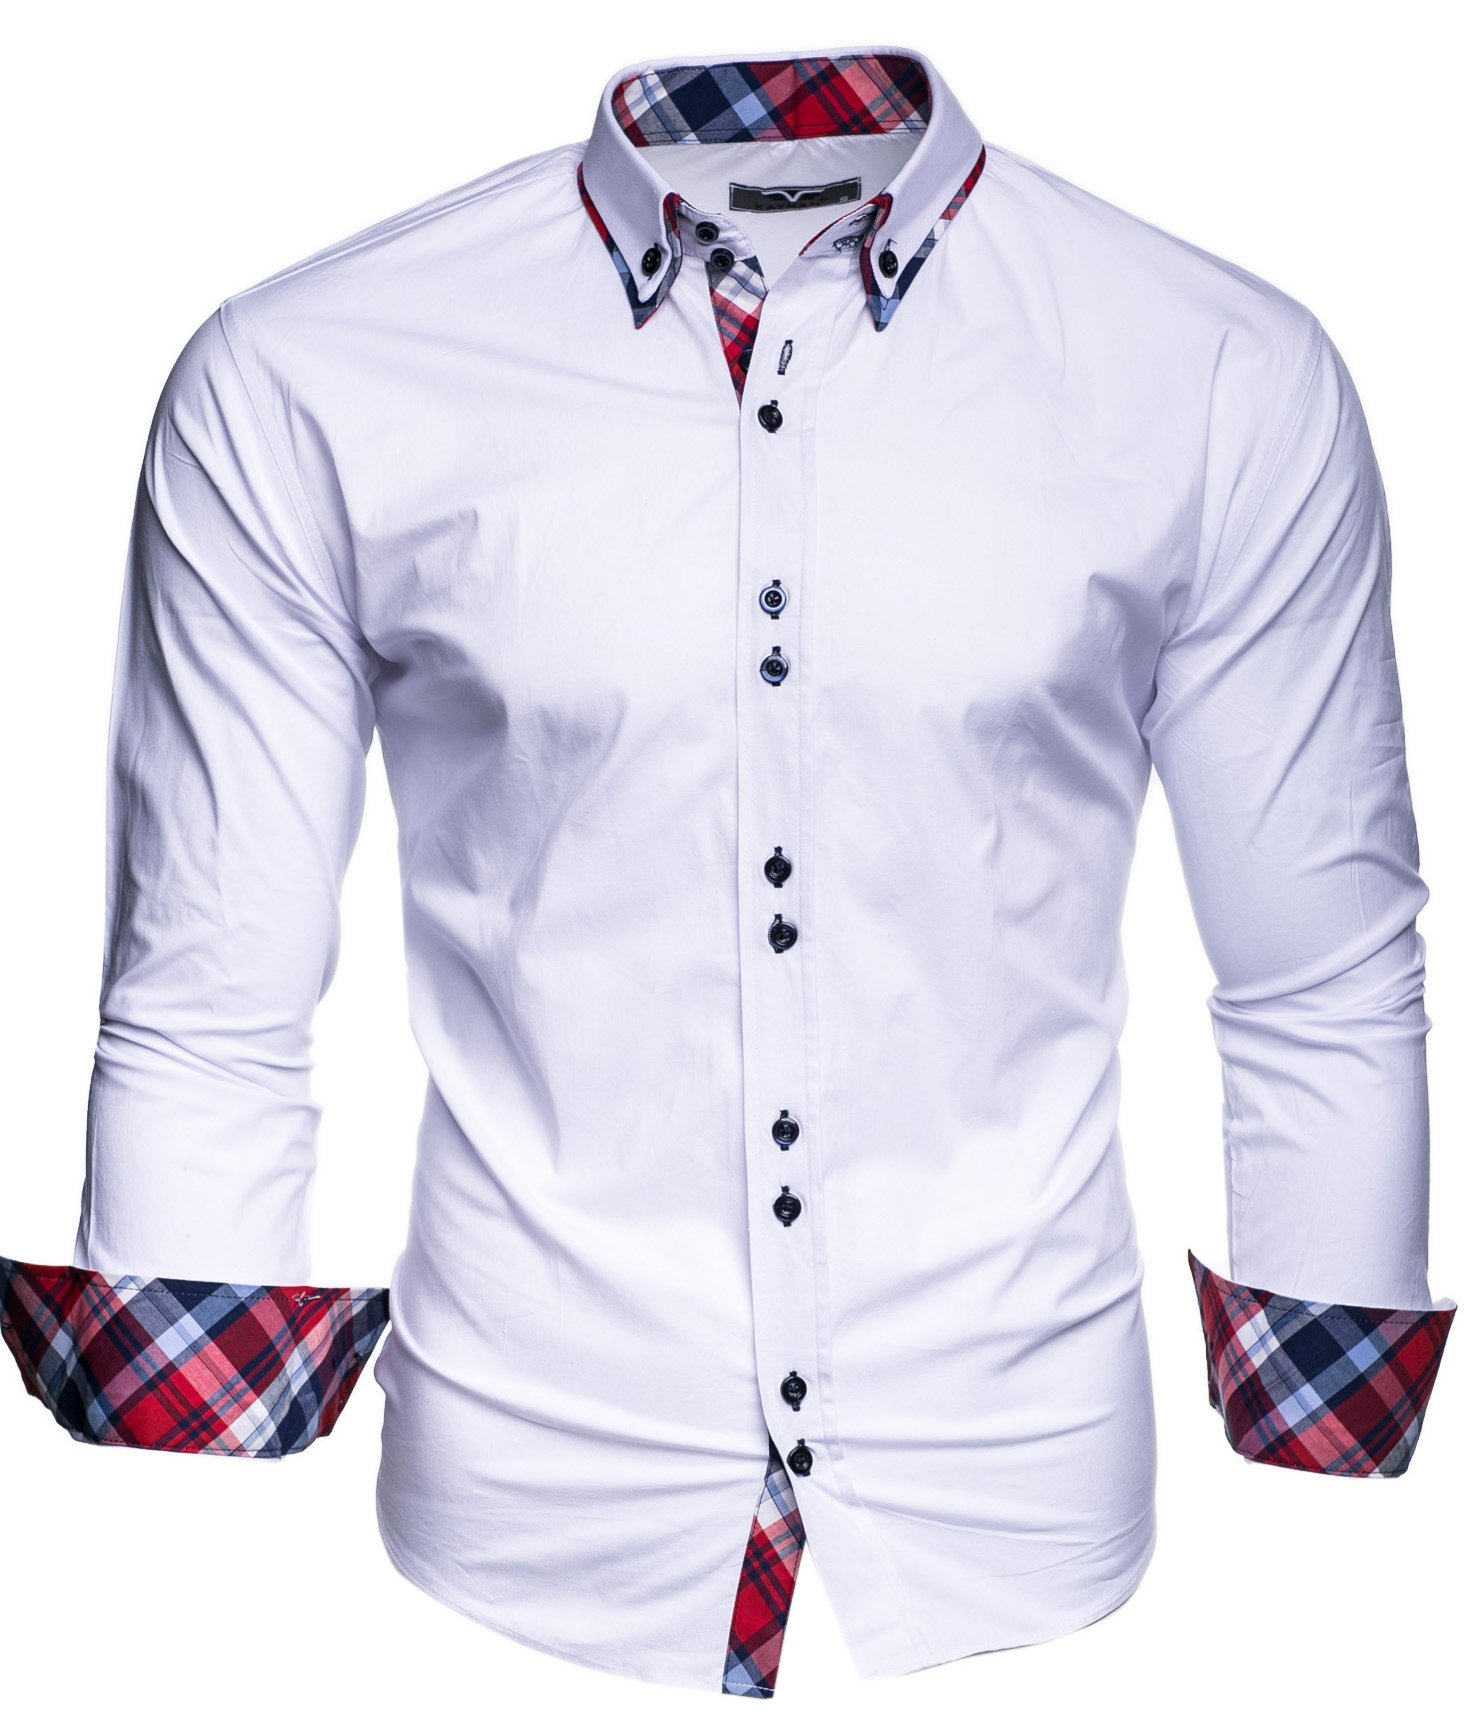 Kayhan Camisas Hombres Camisa Hombre Manga Larga Ropa Camisas de Vestir Slim fácil de Hierro Fit S M L XL XXL-6XL…